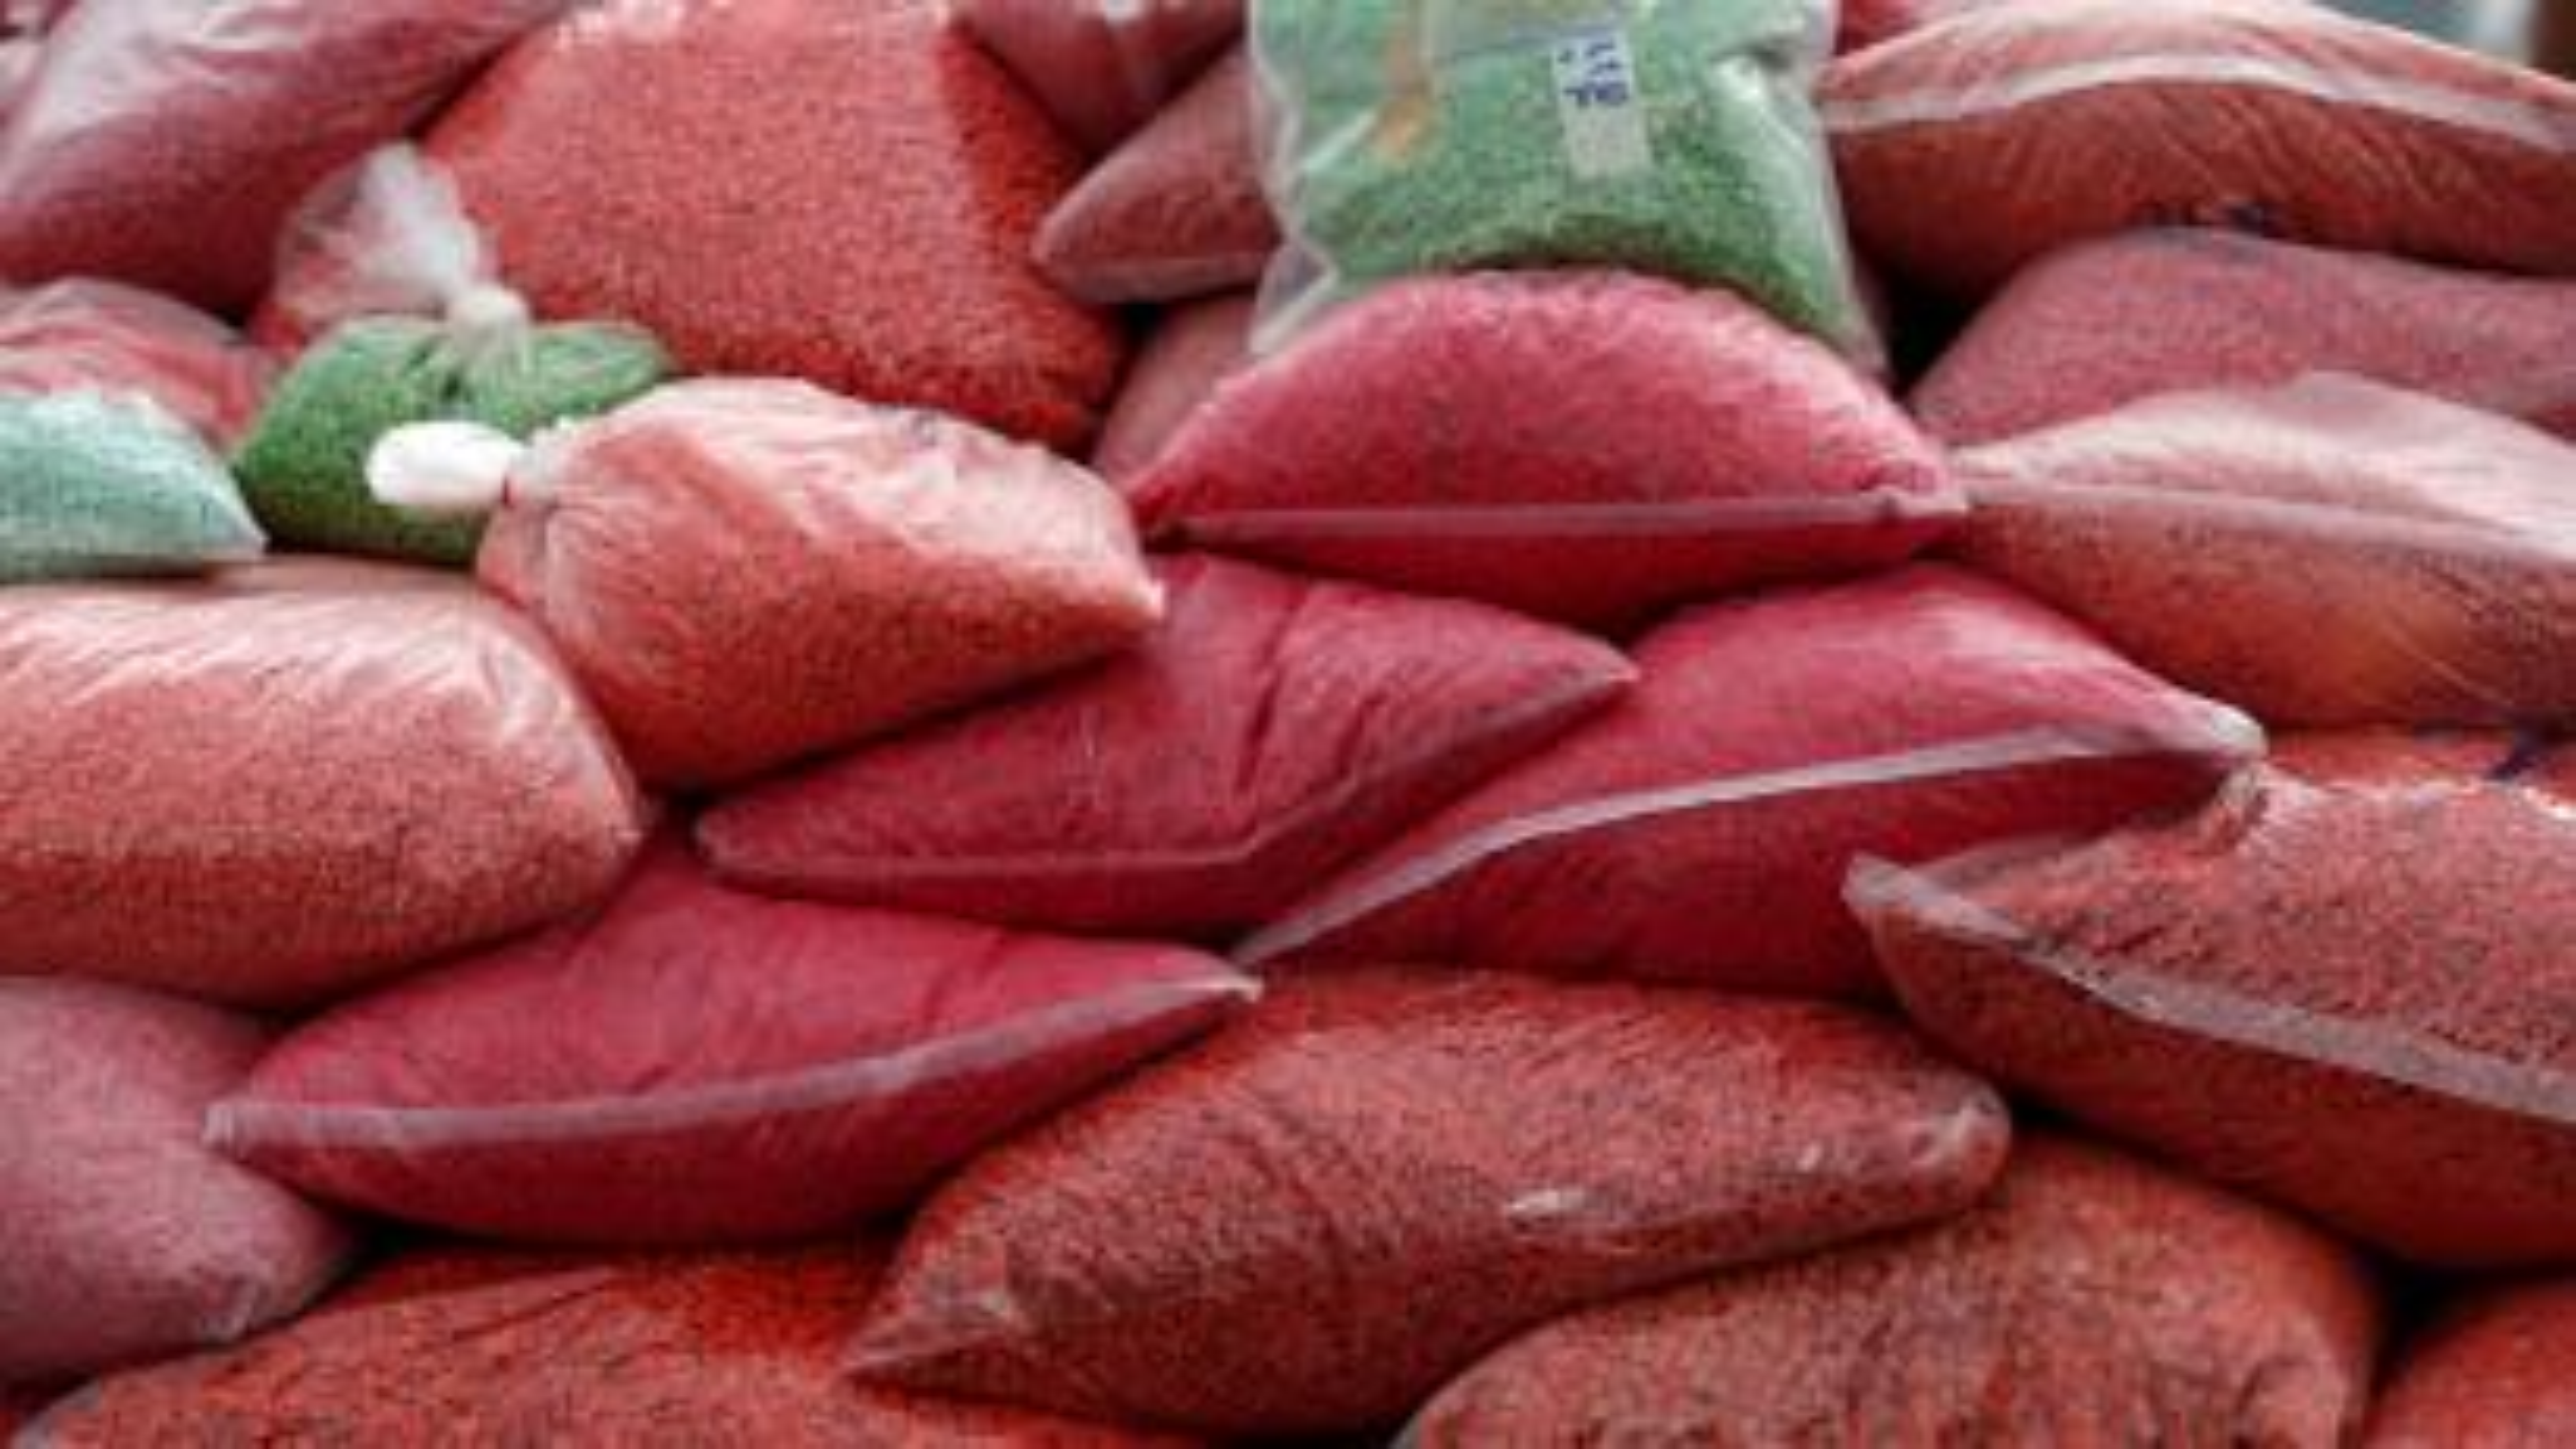 Bags of methamphetamine pills